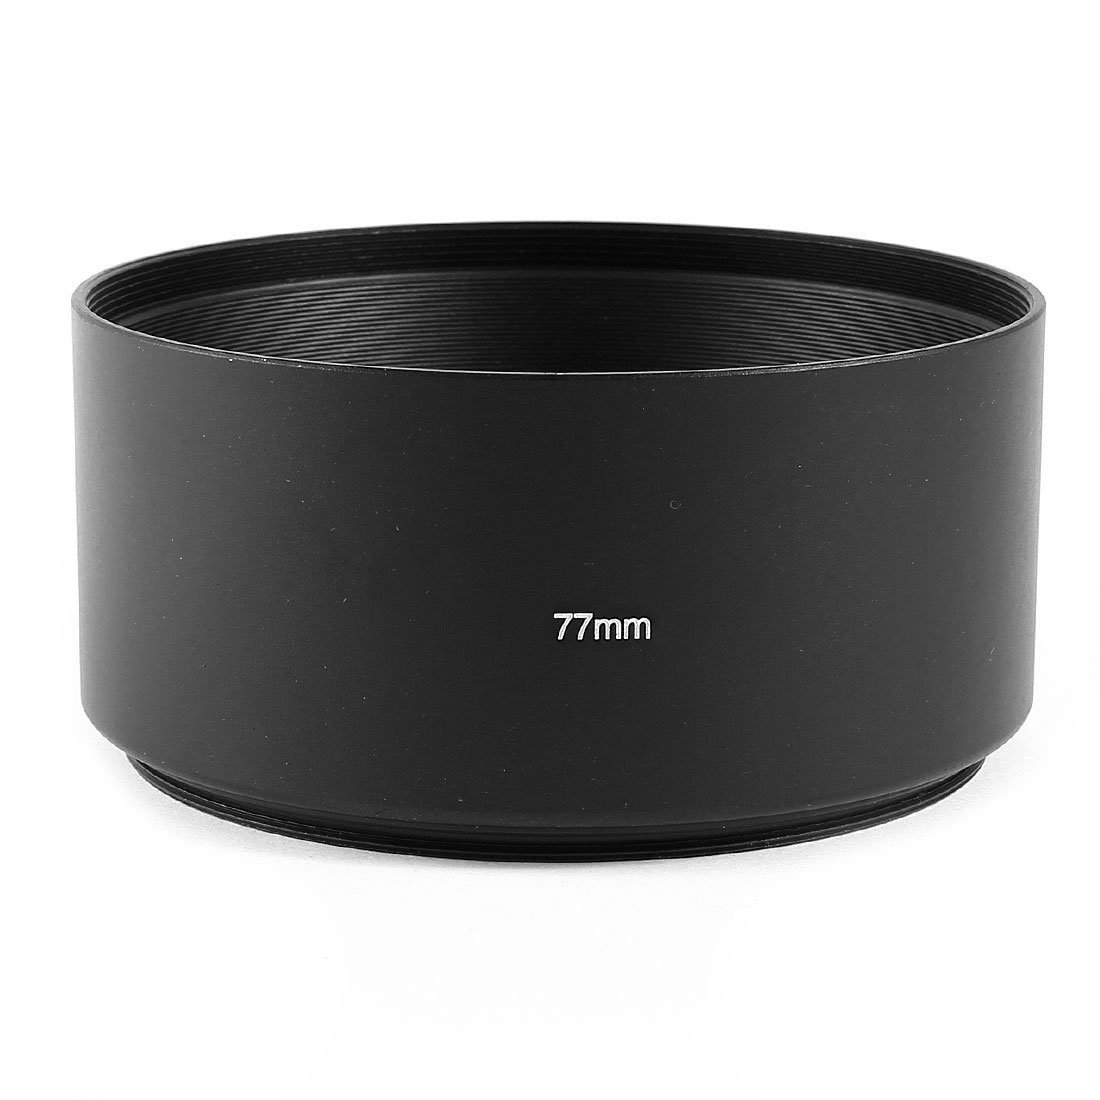 SODIAL(R) Screw Mount 77mm Hood for Telephoto 80-200mm Lens Shade Black 066194